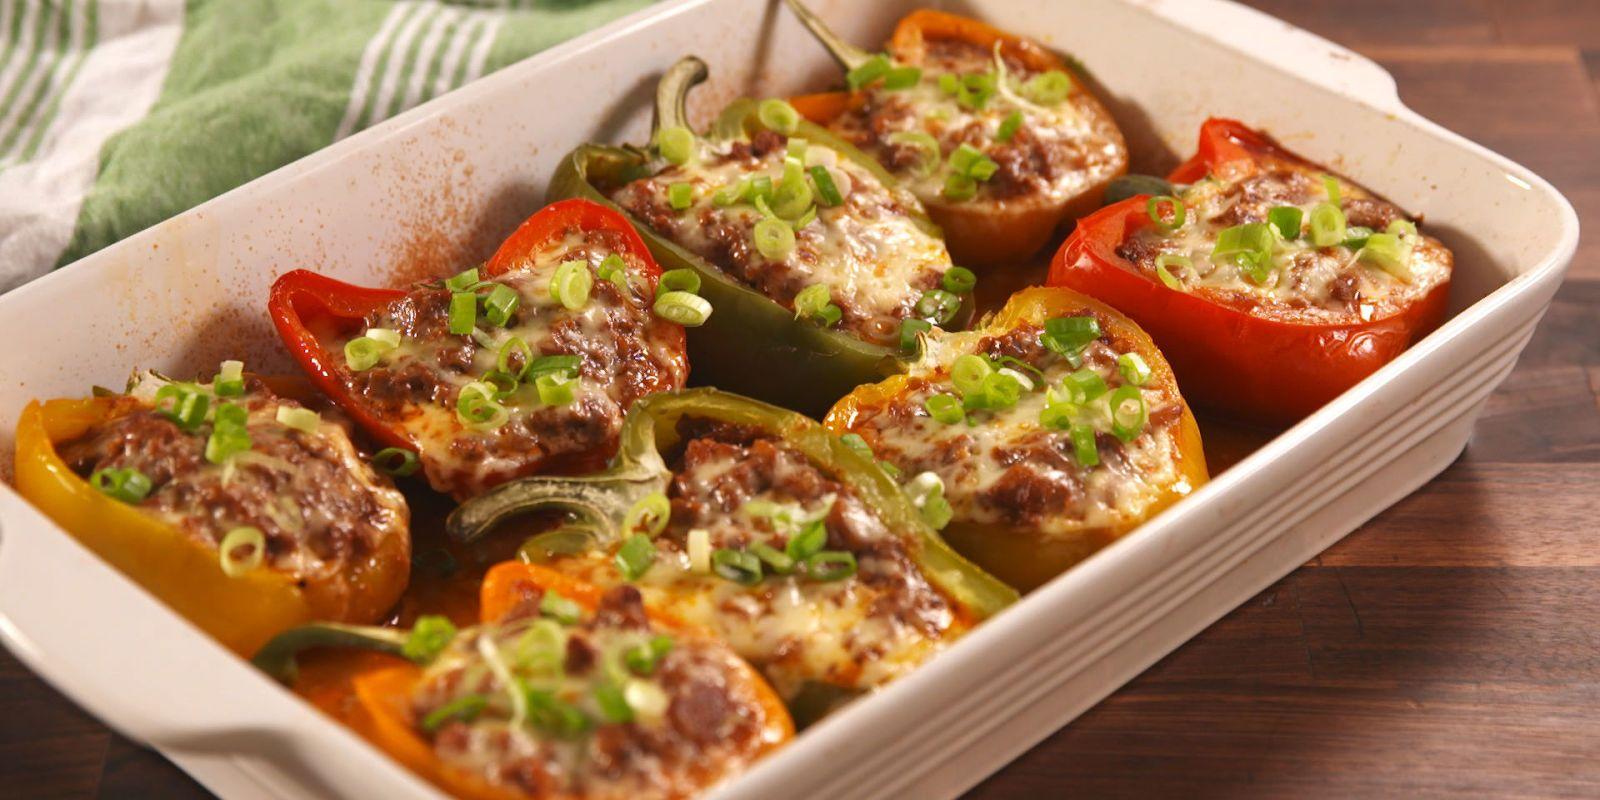 Best Sloppy Joe Stuffed Peppers Recipe  How to Make